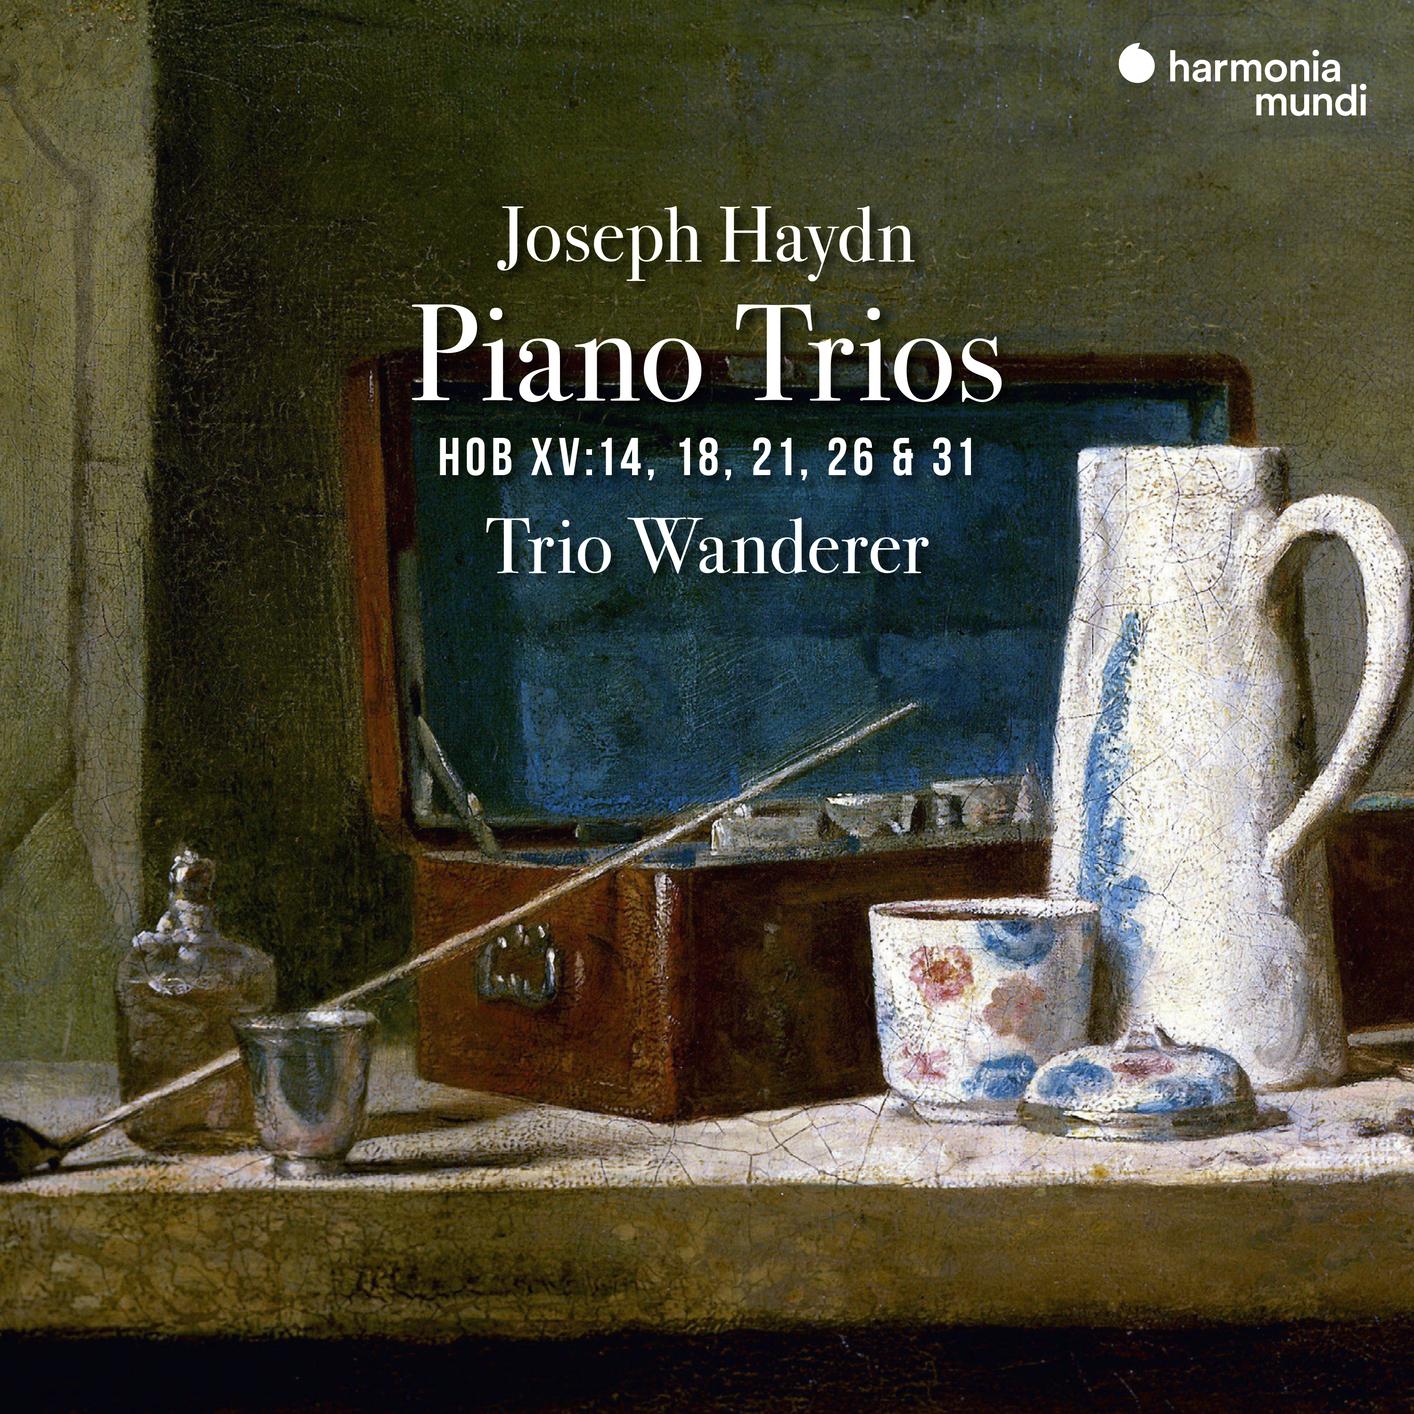 Words In Winter Score Soprano Orchestra Sheet Music Book Exquisite Craftsmanship; Strings Hallgrimsson